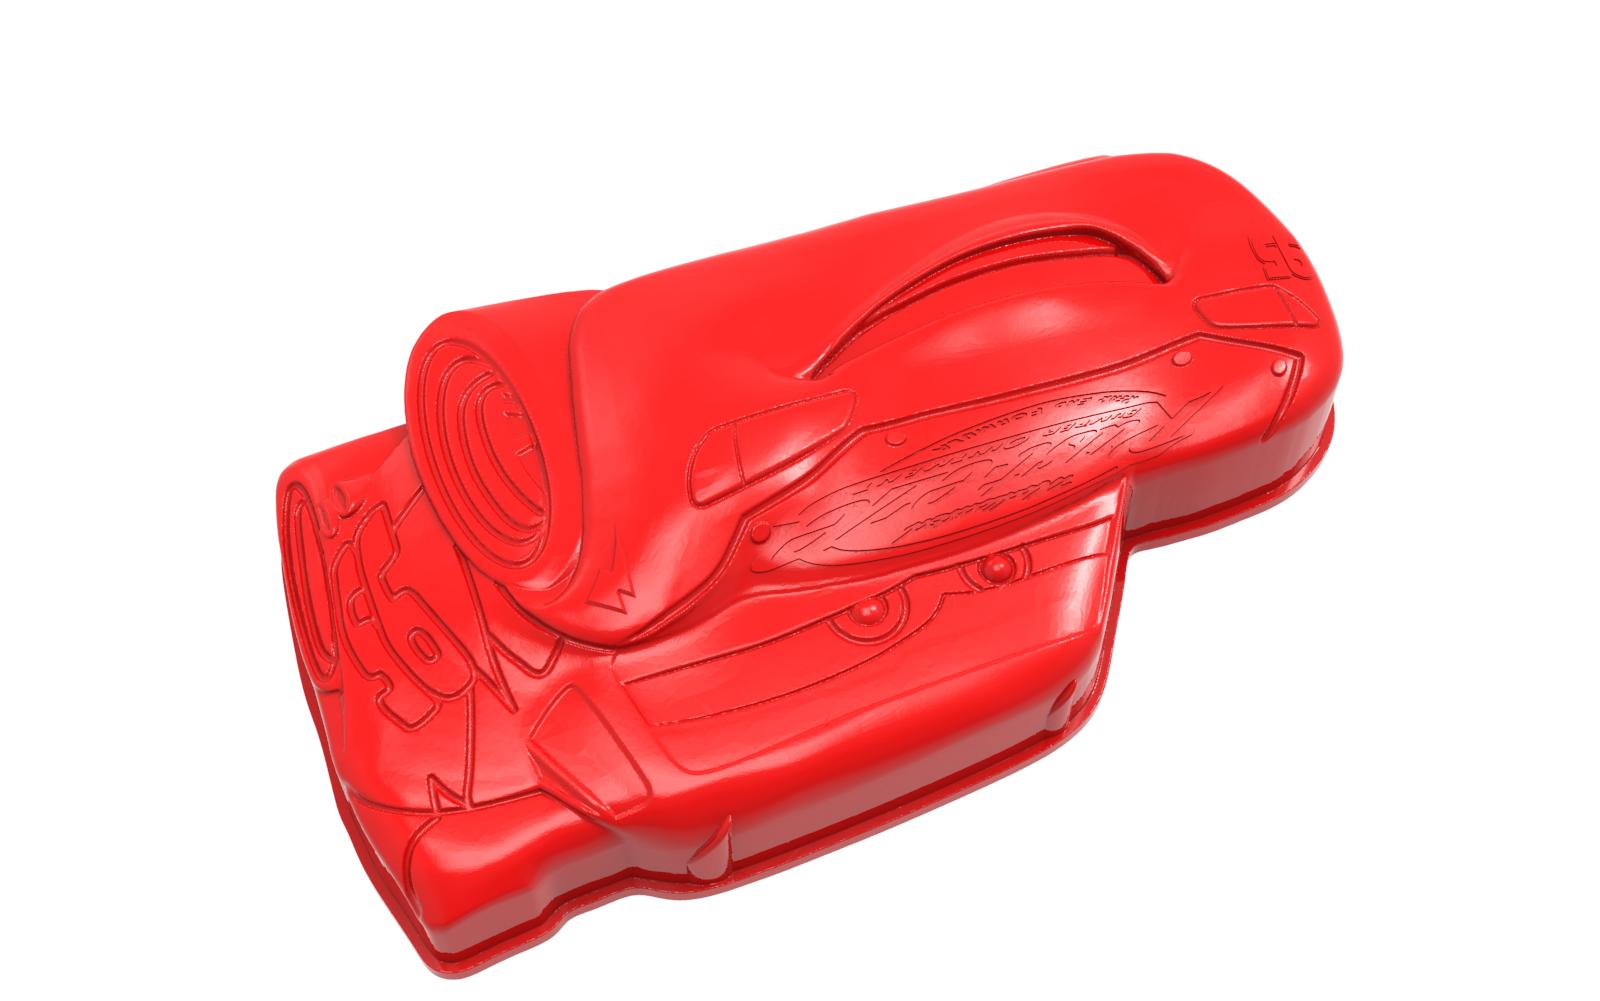 untitled.1666.png Download free STL file Pixar Cars - Mcqueen • 3D printable design, hcchong